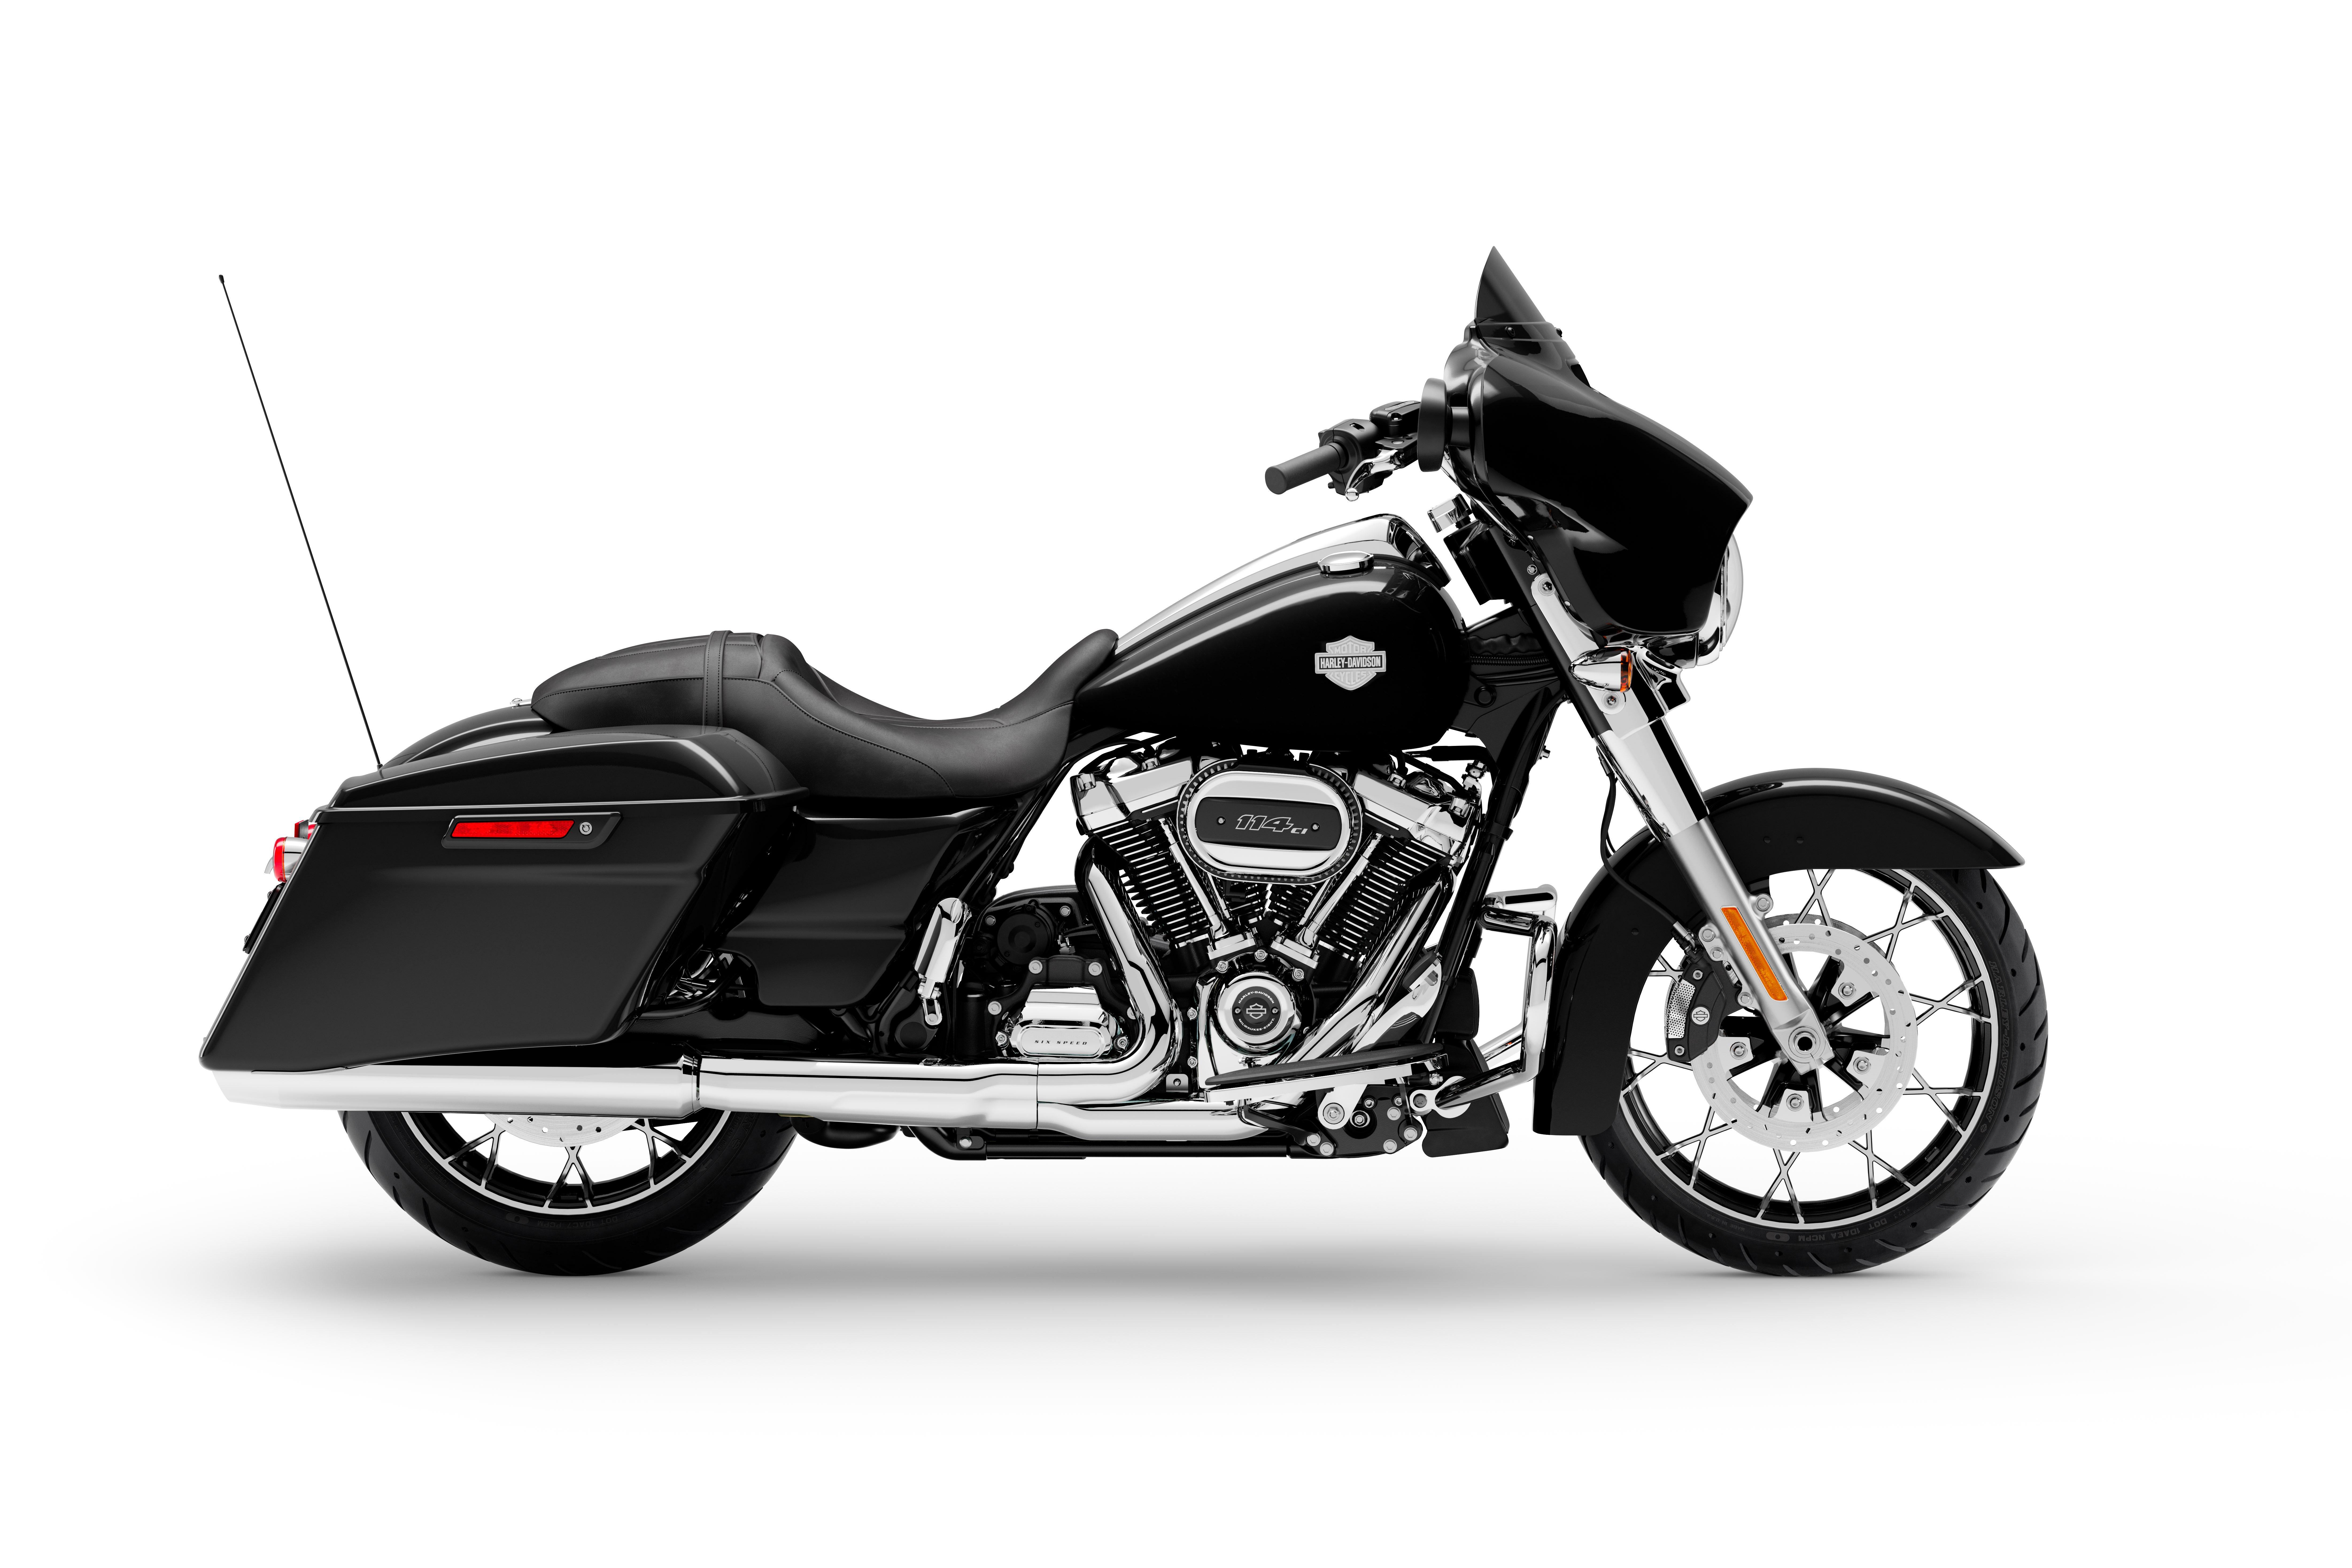 2021 Harley-Davidson Street Glide Special [10]